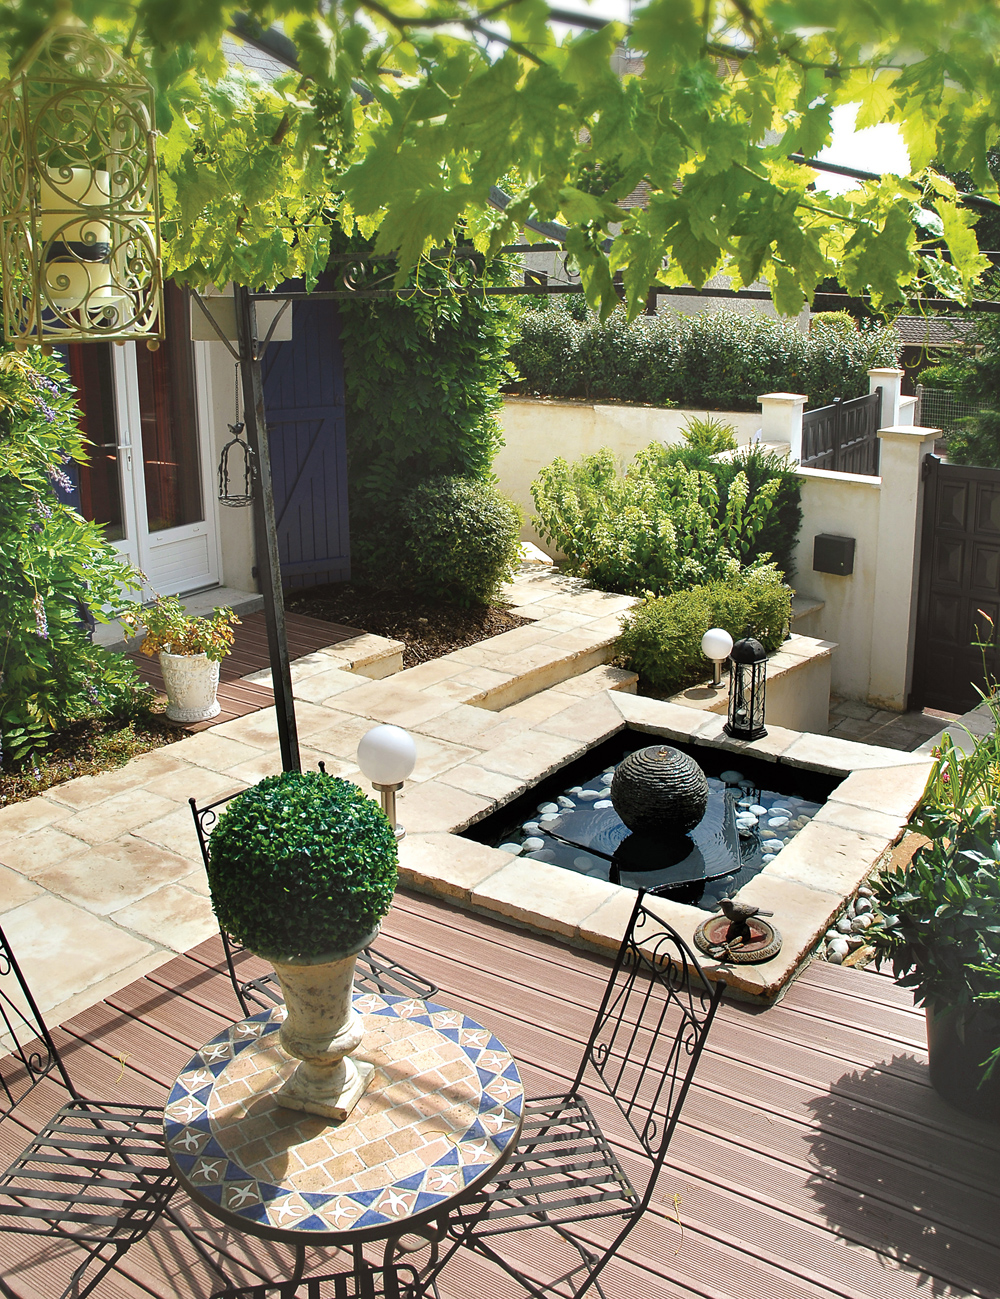 weathered limestone paving bradstone circles. Black Bedroom Furniture Sets. Home Design Ideas